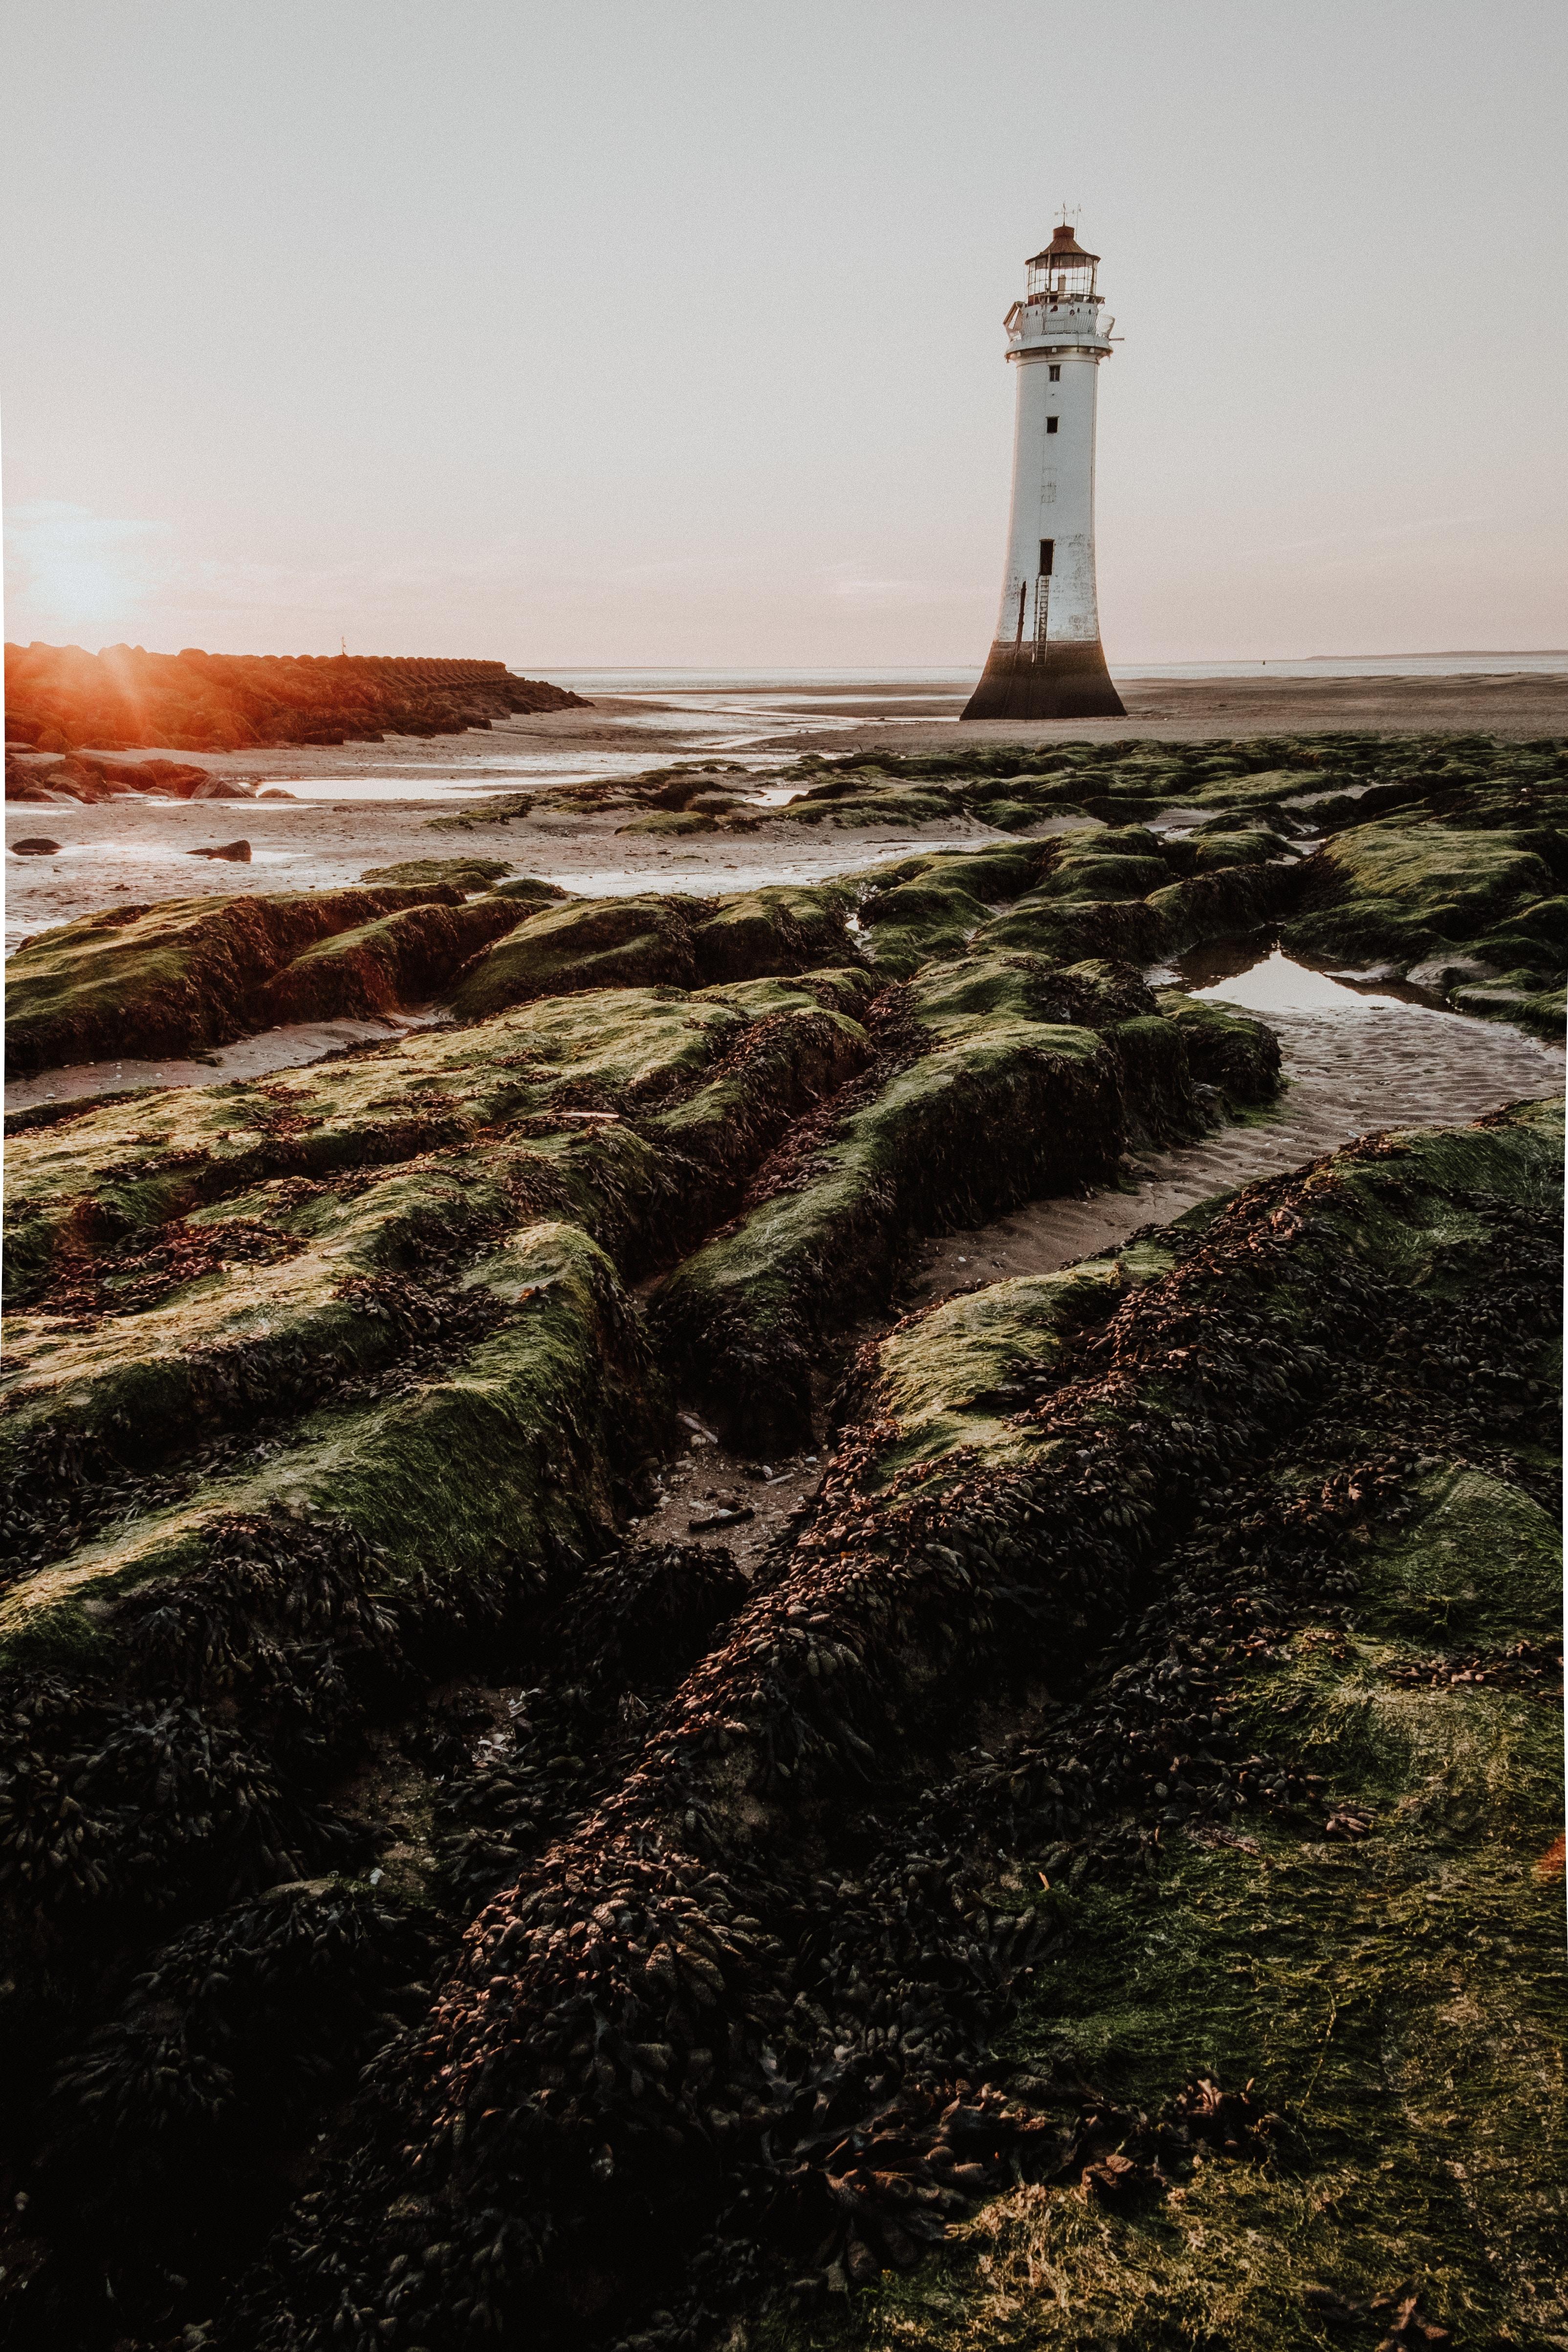 landscape photo of lighthouse